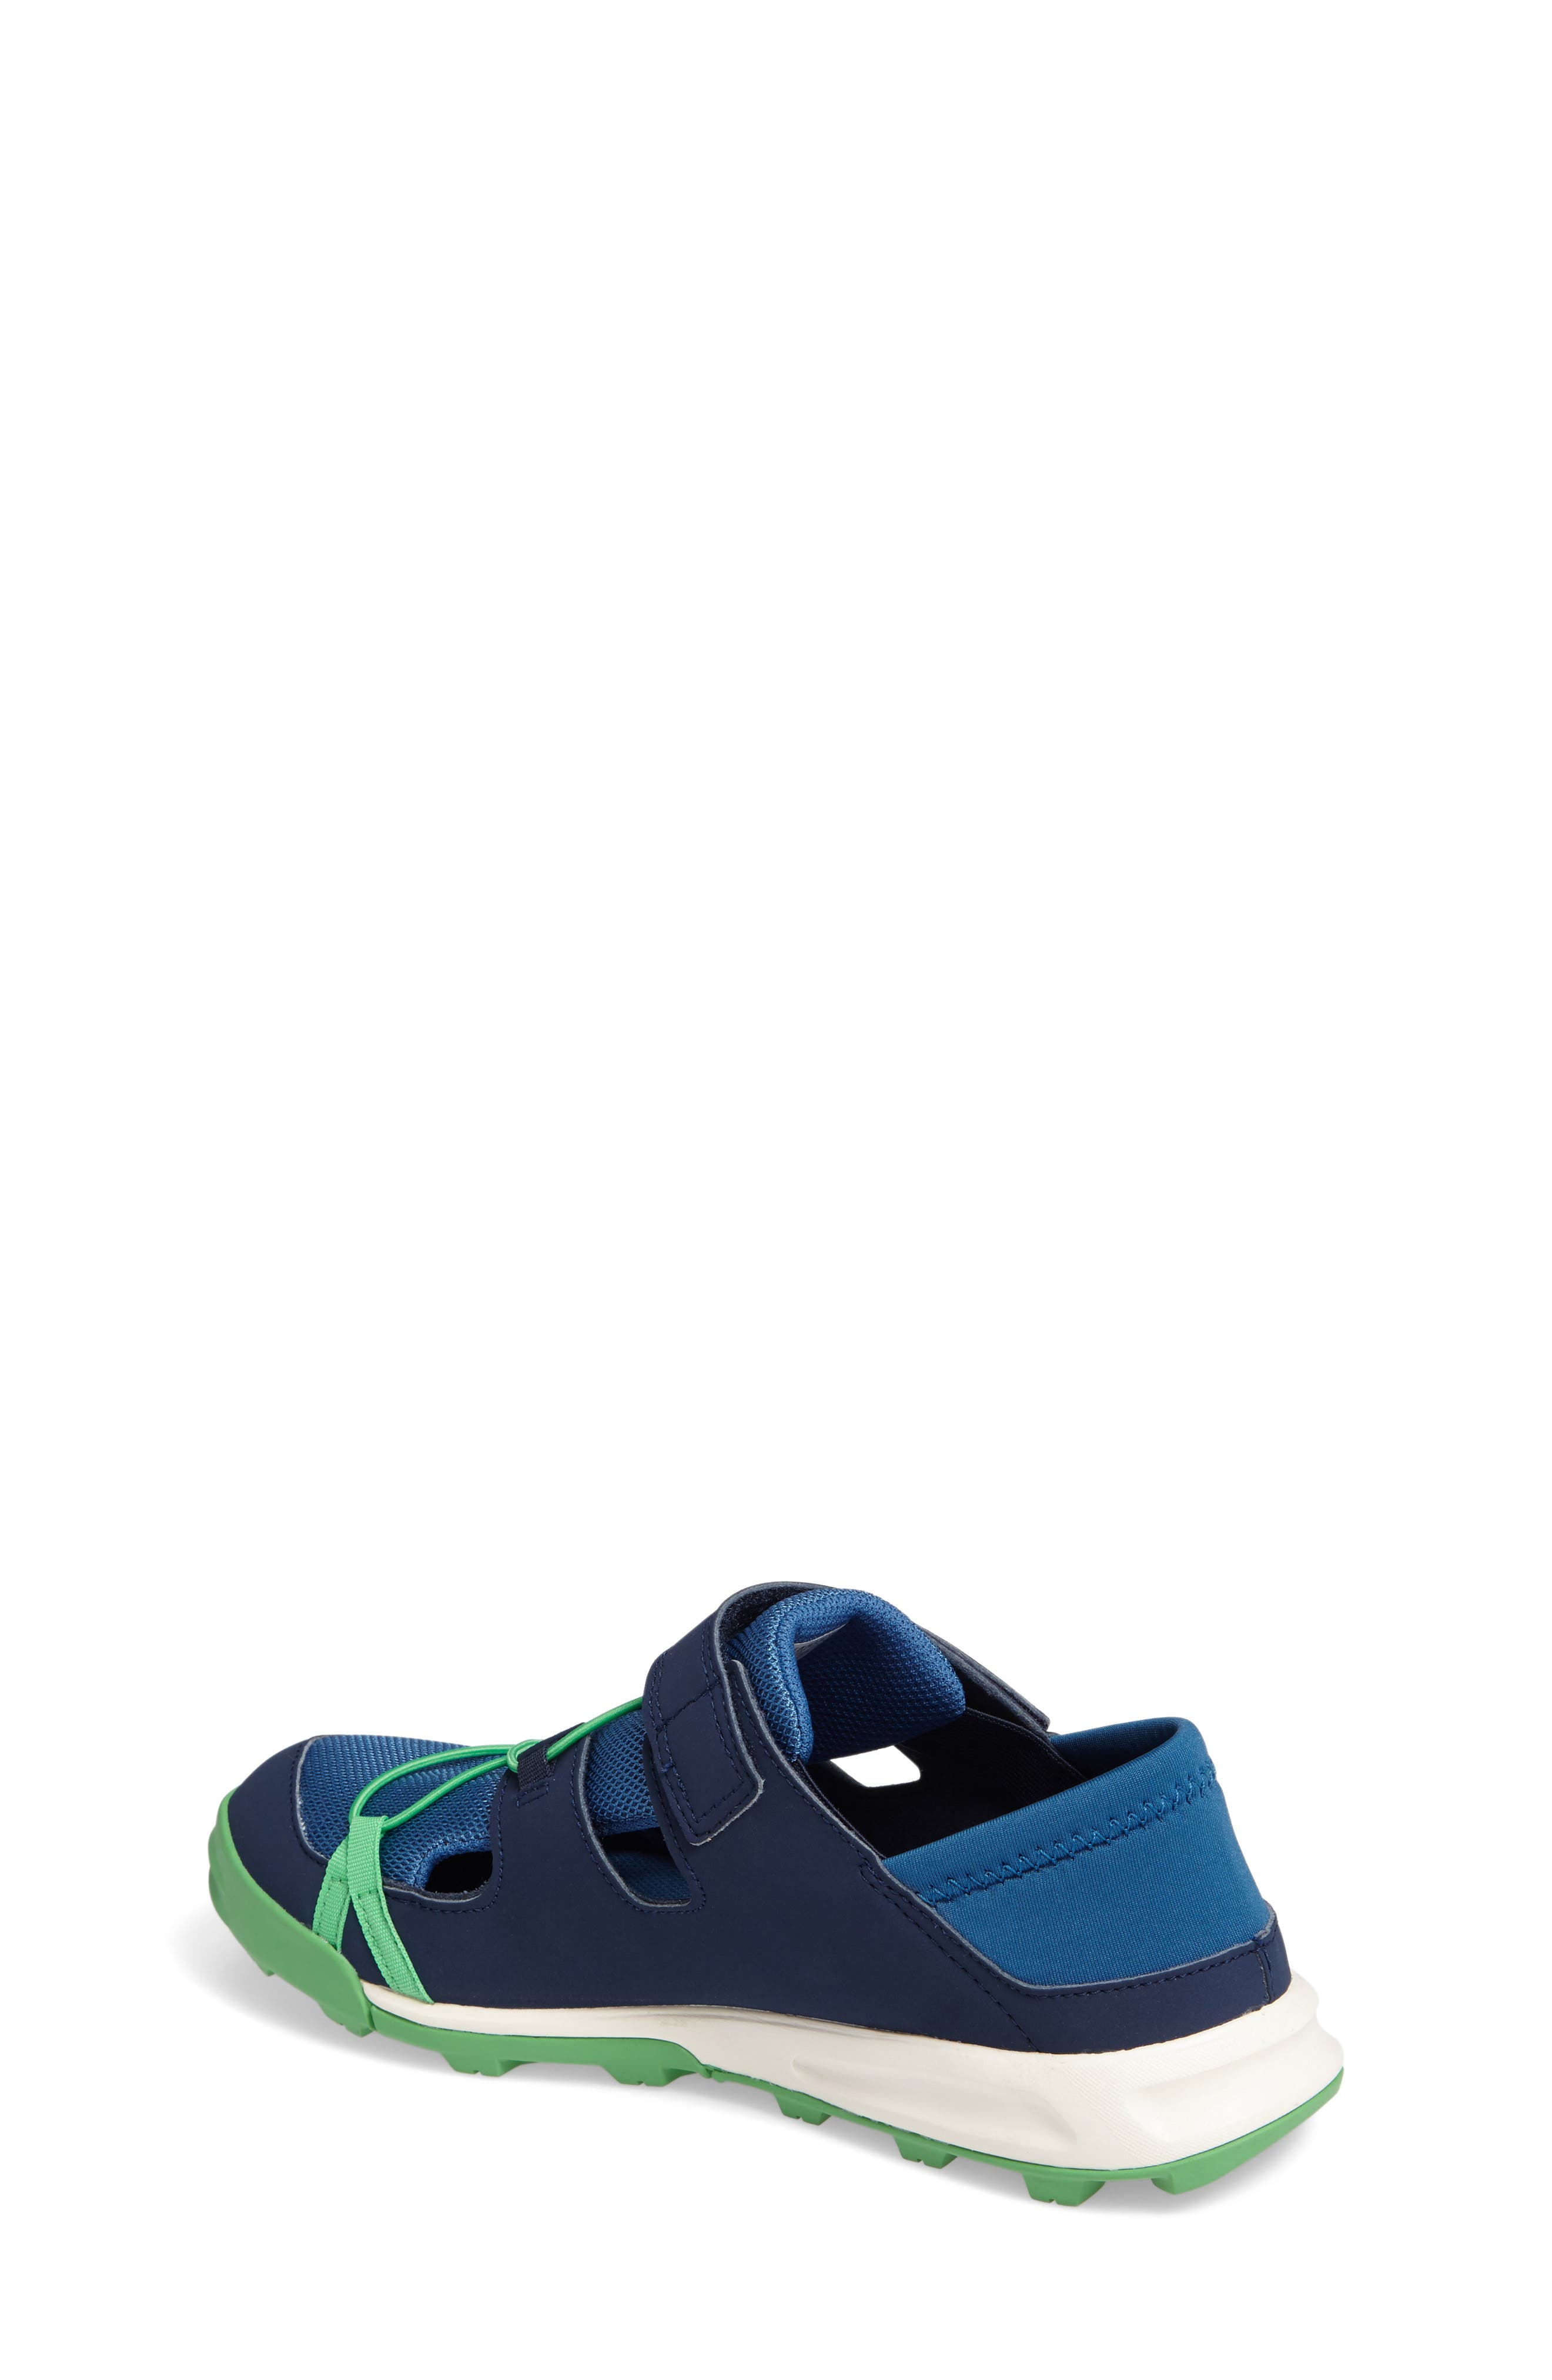 Terrex Tivid Sneaker,                             Alternate thumbnail 2, color,                             420